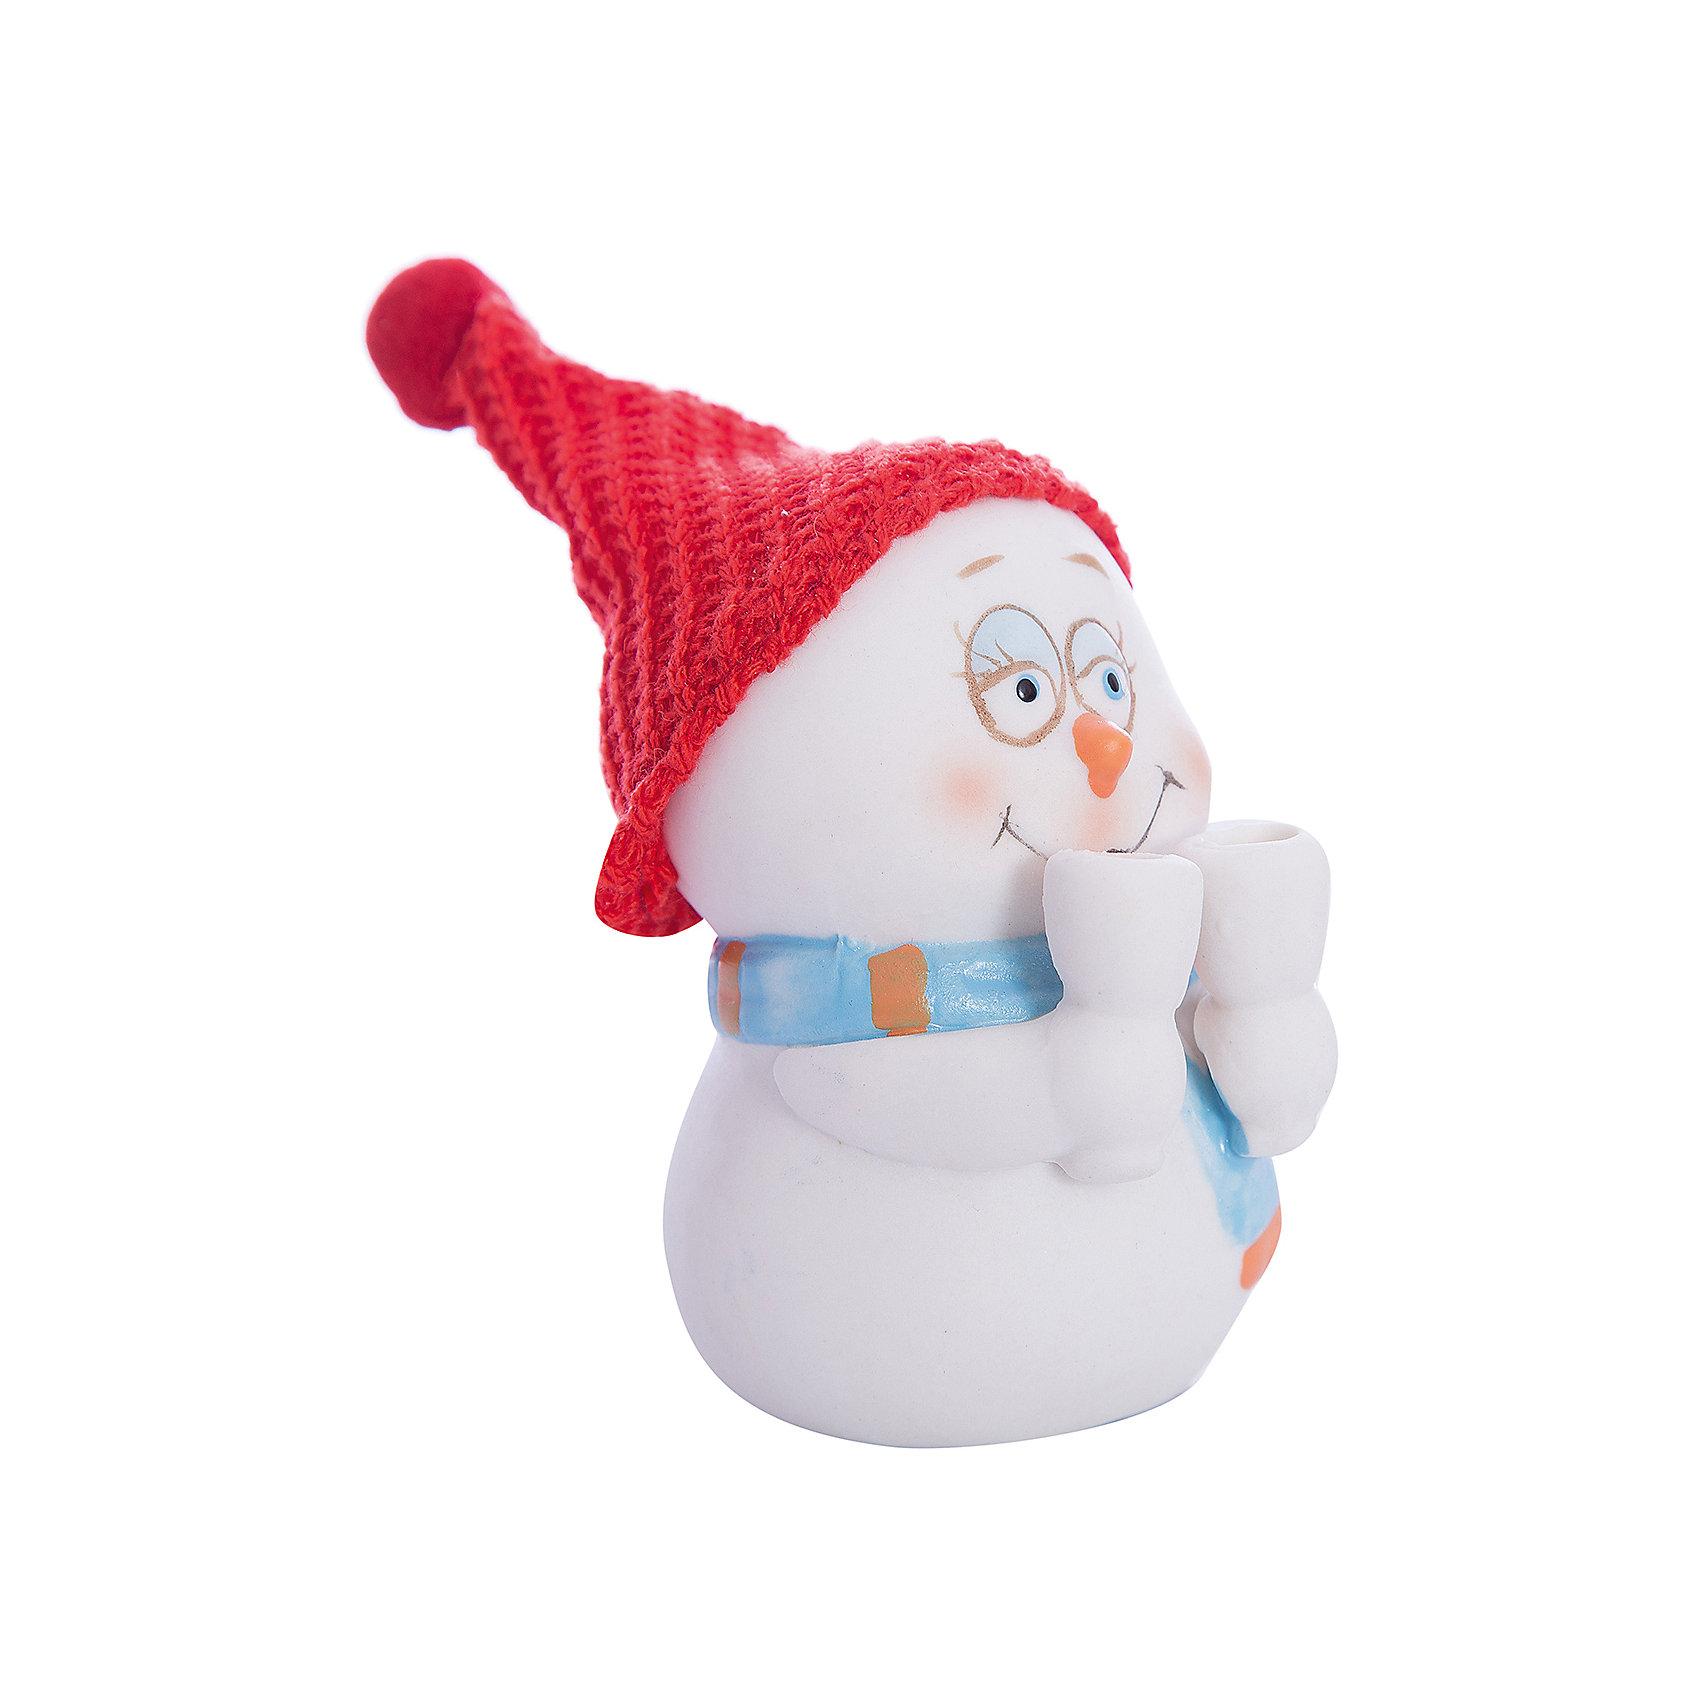 Фигурка Снеговик с бокалами 8 см, керамикаНовогодняя фигурка снеговика Снеговик с бокалами арт.38338 (8см, керамика)<br><br>Ширина мм: 70<br>Глубина мм: 60<br>Высота мм: 80<br>Вес г: 133<br>Возраст от месяцев: 60<br>Возраст до месяцев: 600<br>Пол: Унисекс<br>Возраст: Детский<br>SKU: 5144556